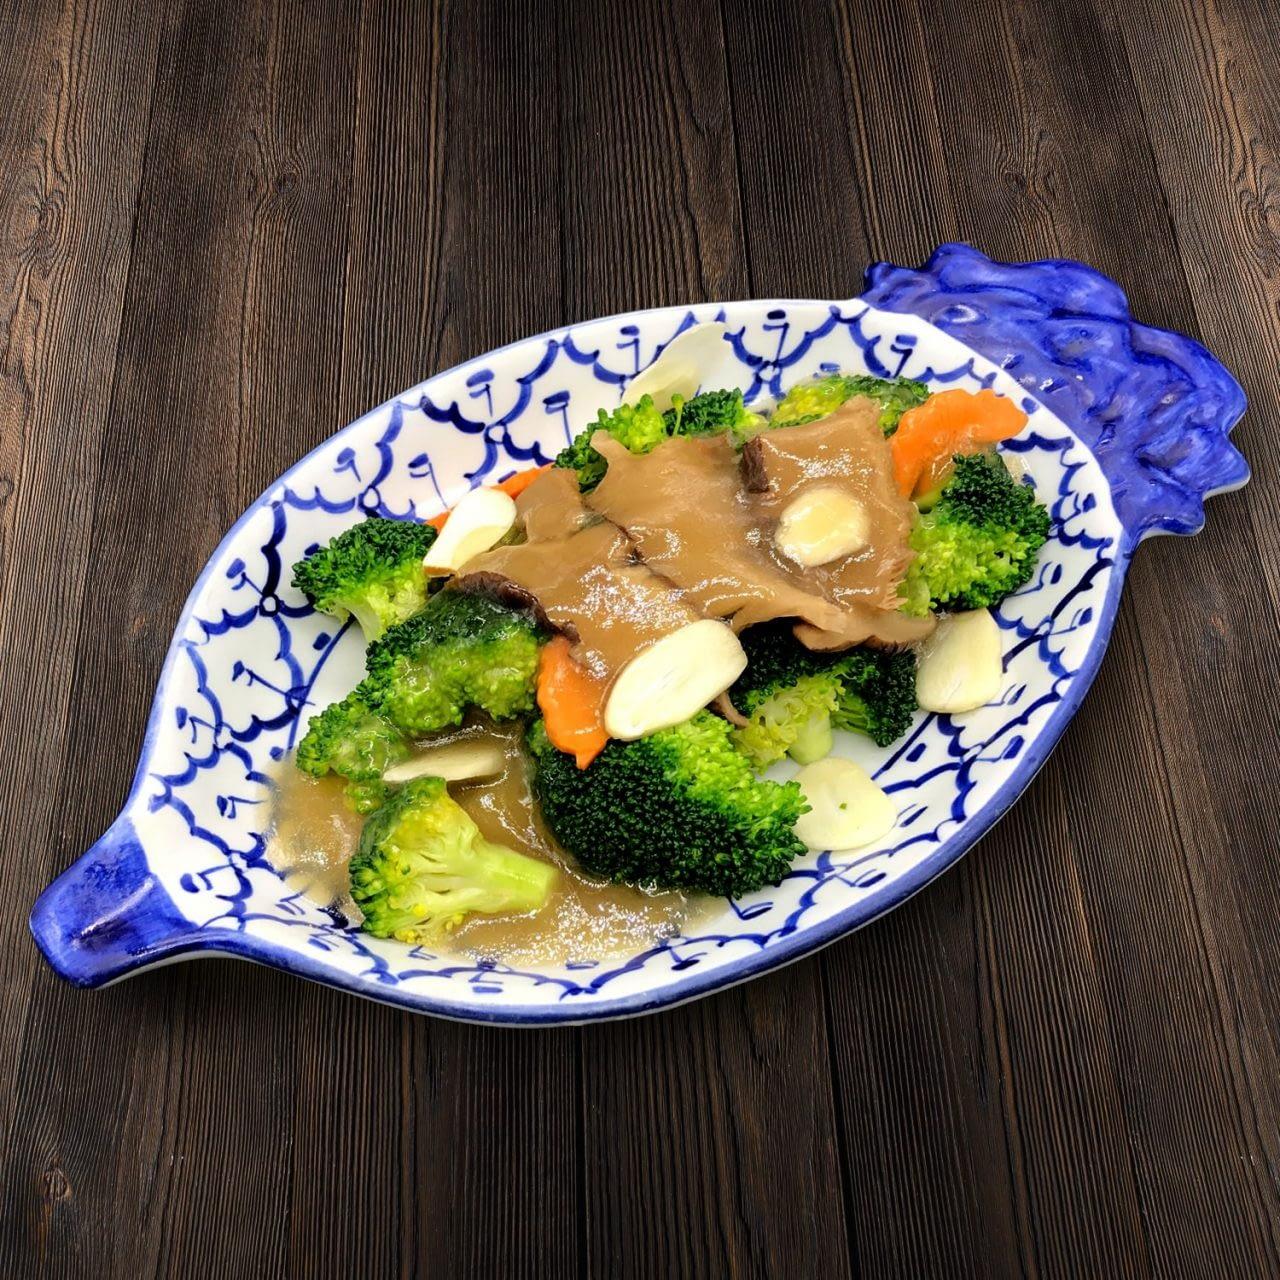 Thai Food Delivery Kuala Lumpur Broccoli with Garlic